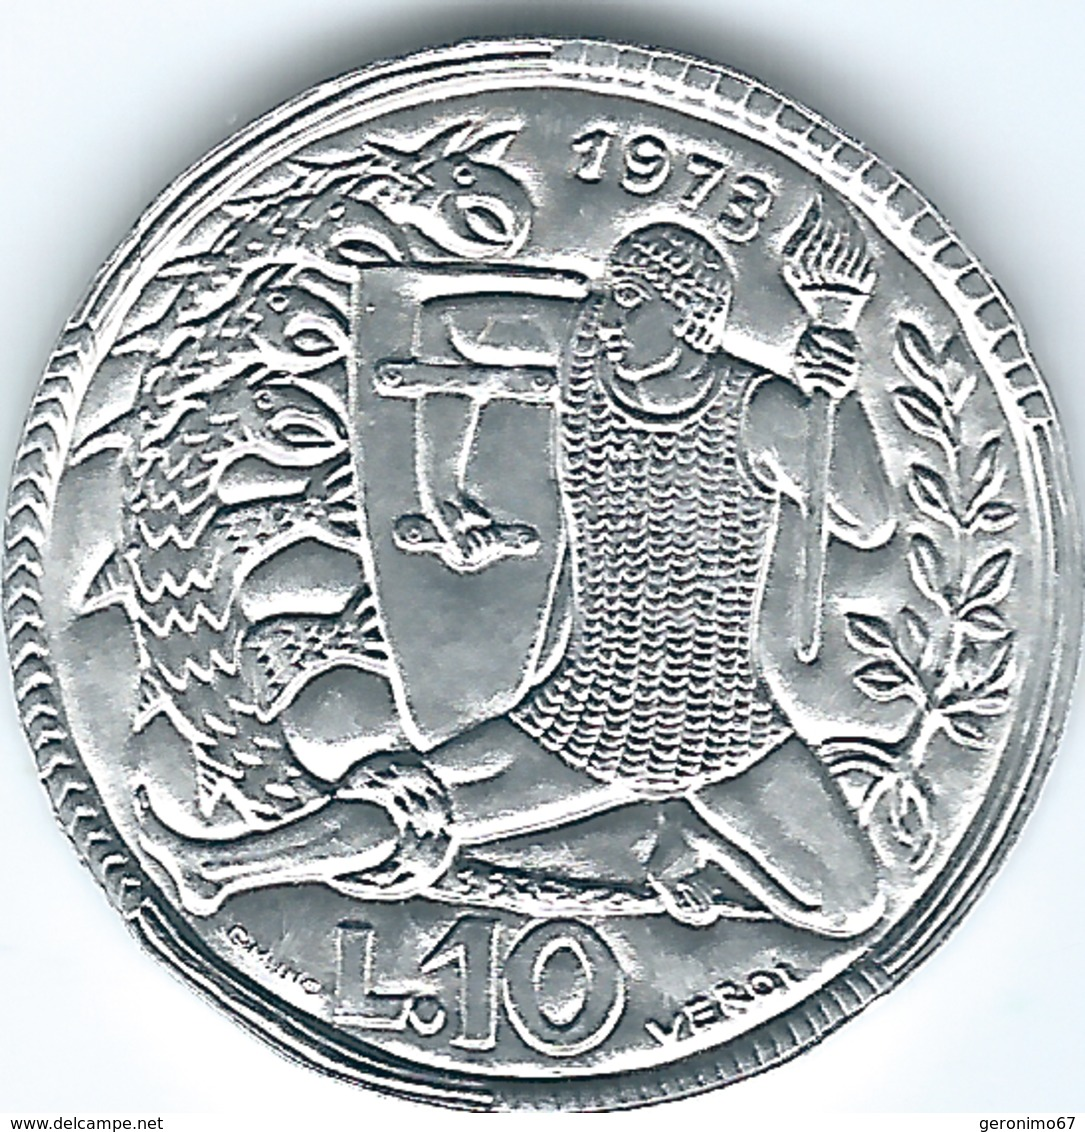 San Marino - 1973 - 10 Lire - KM25 - San Marino